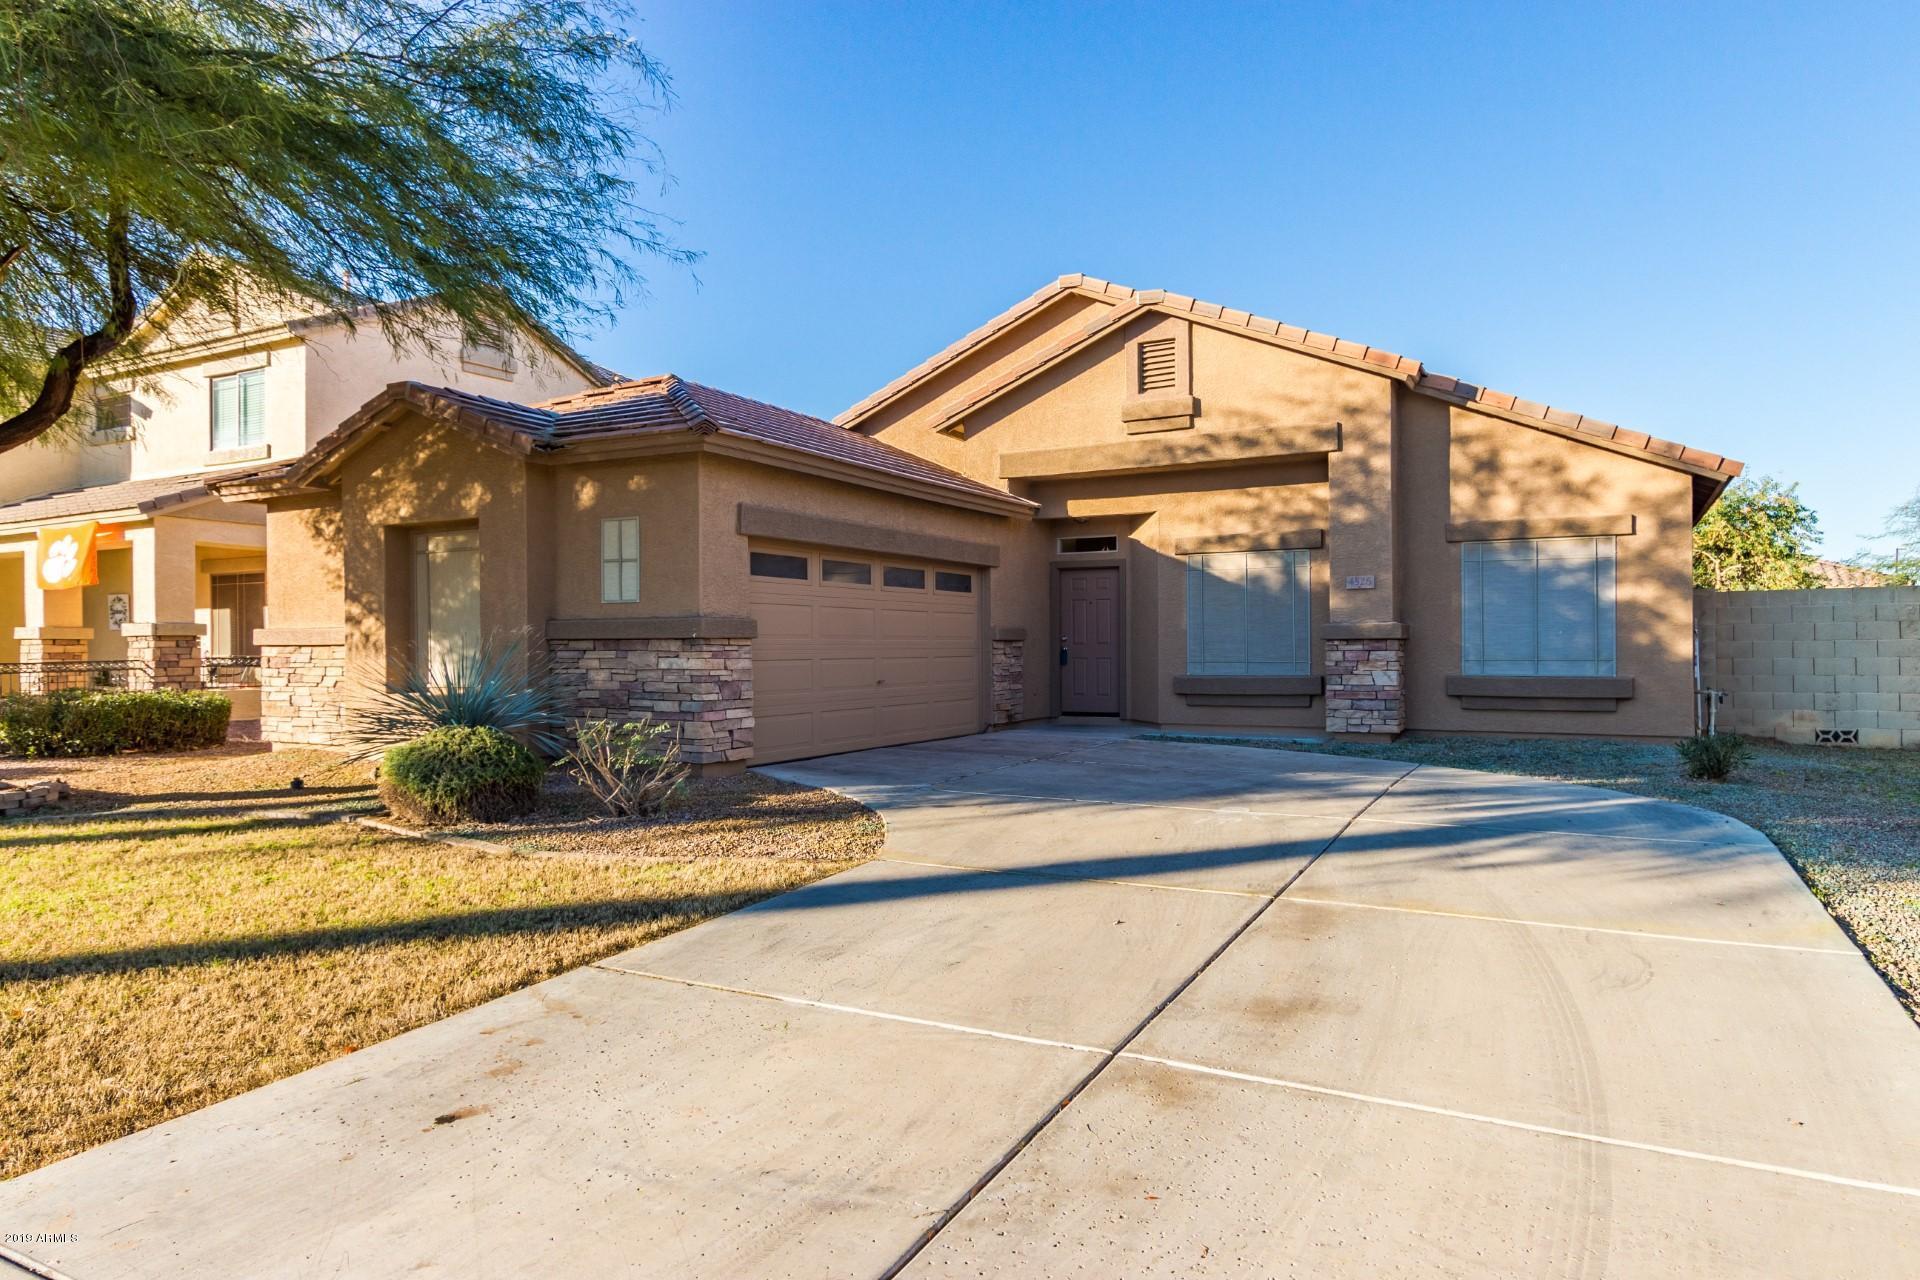 Photo of 4526 S MARBLE Street, Gilbert, AZ 85297